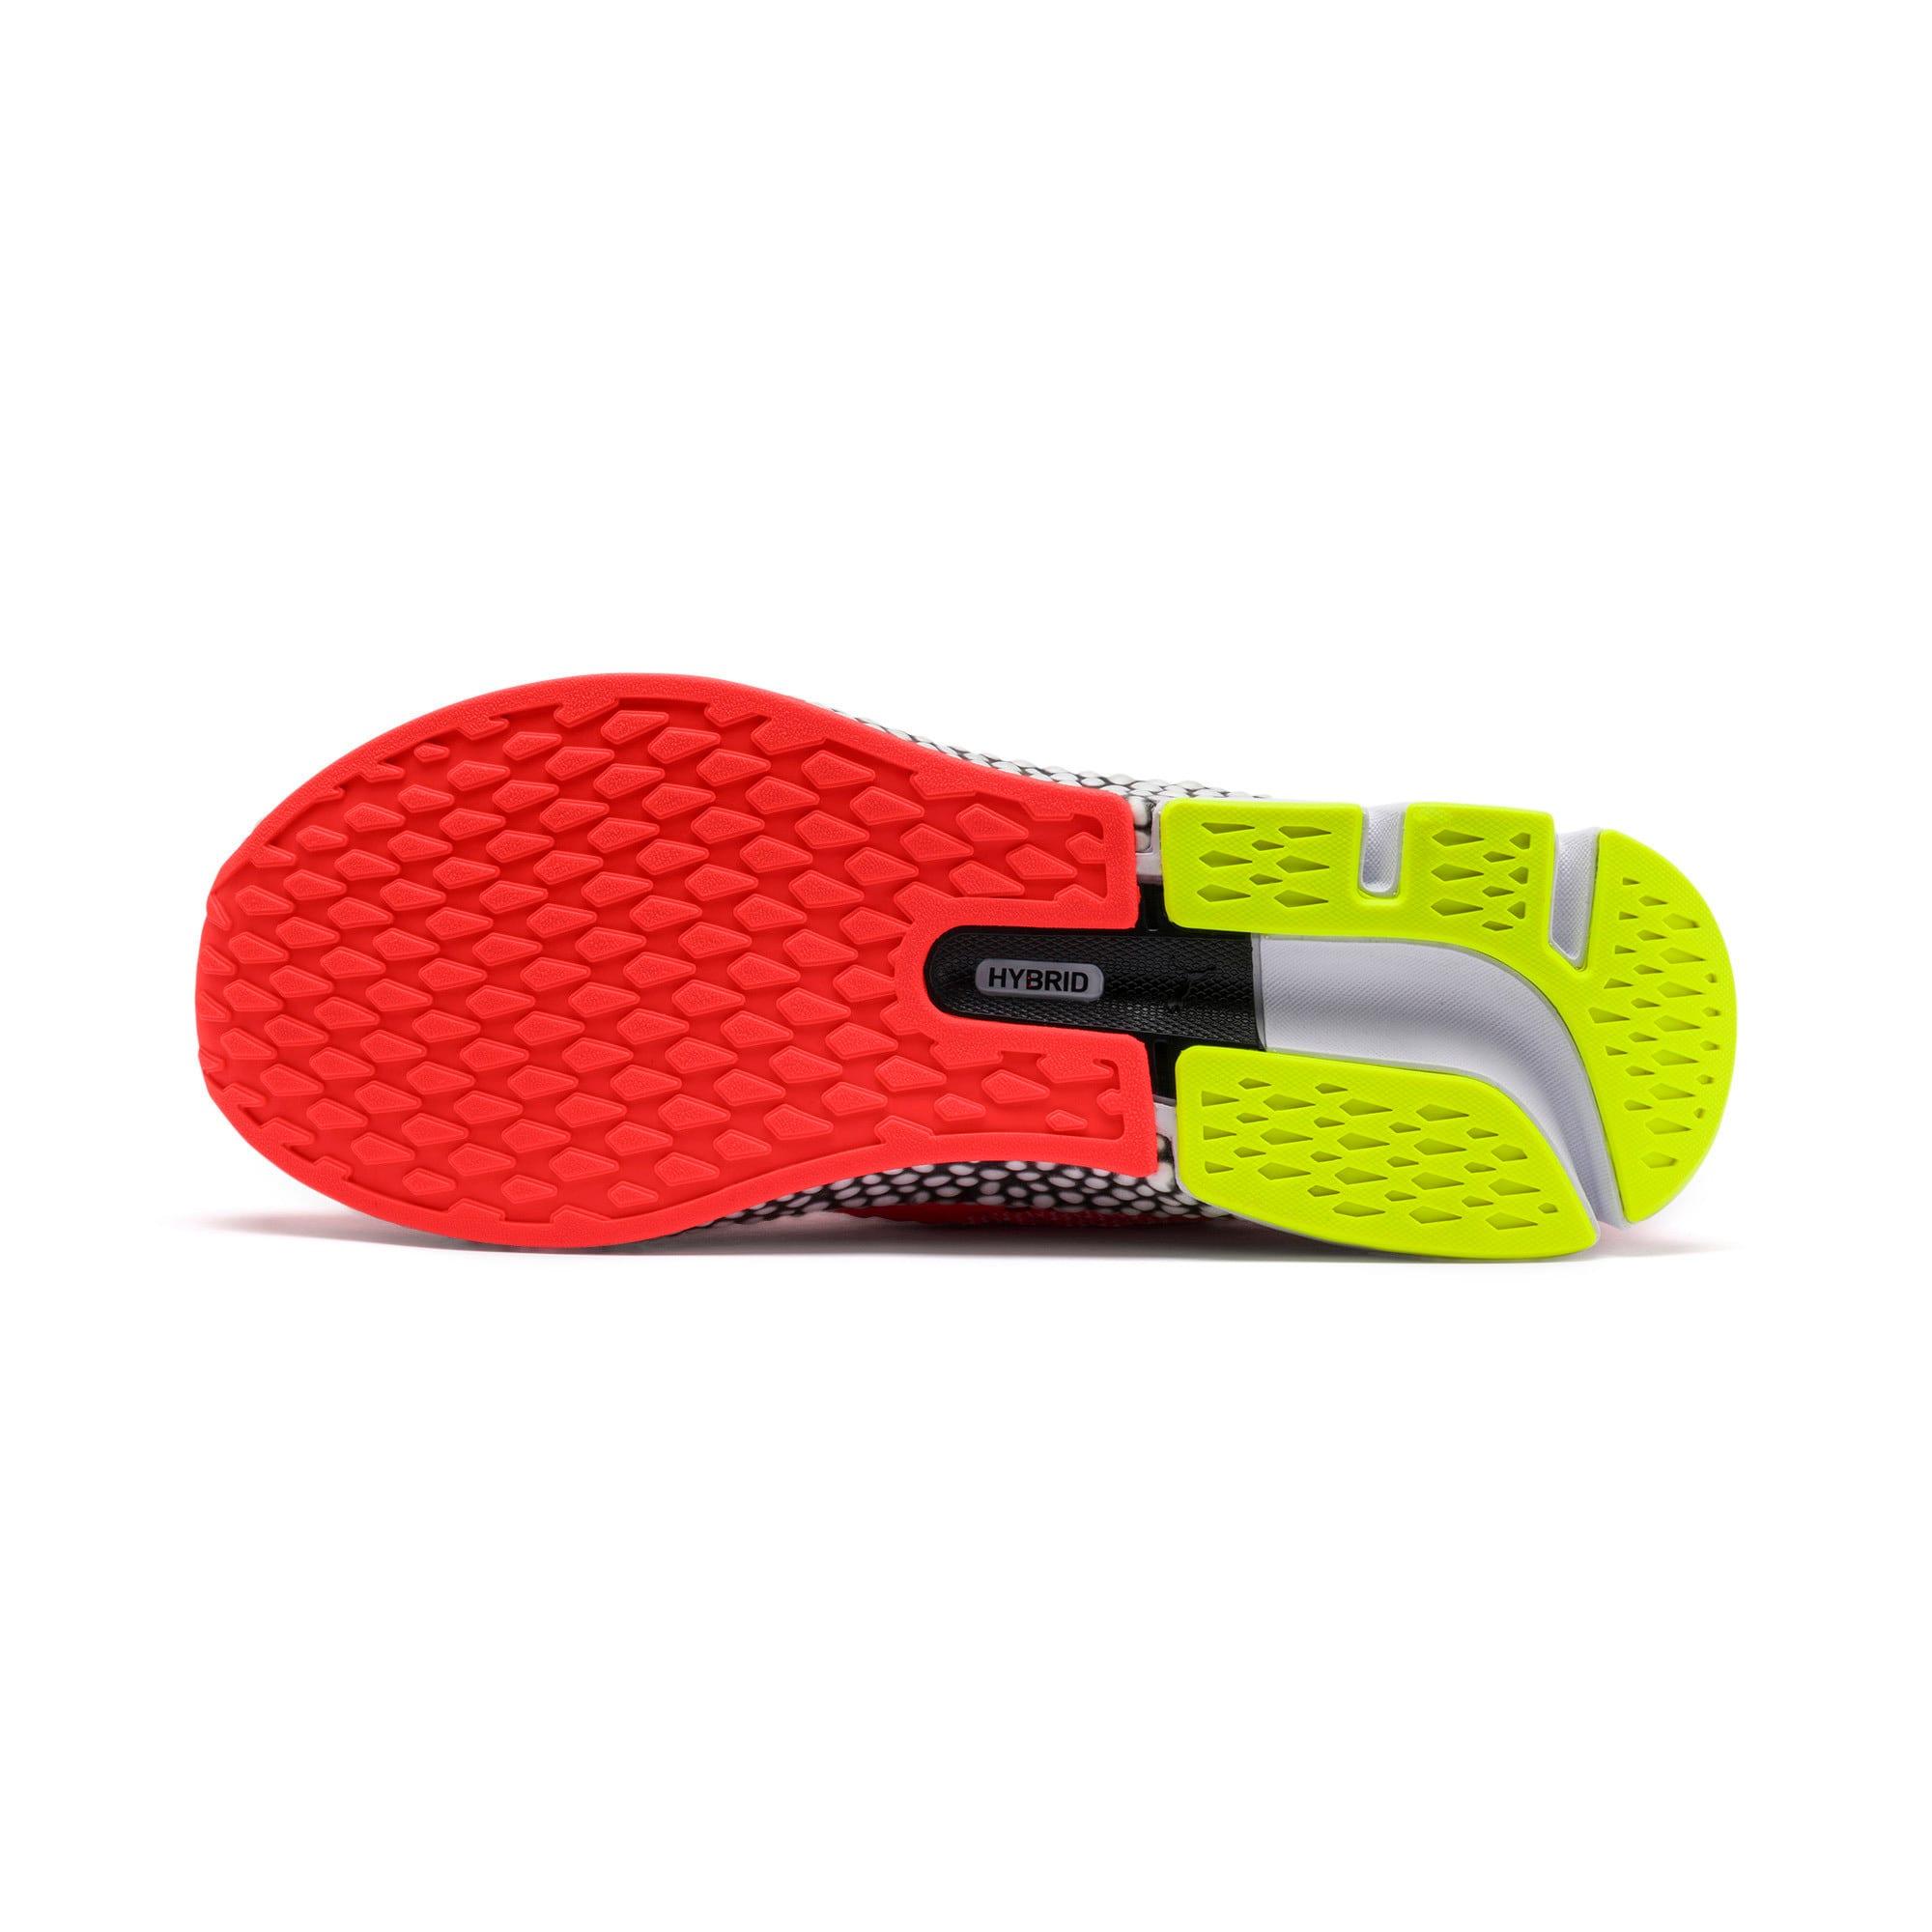 Thumbnail 5 of HYBRID Astro Men's Running Shoes, Nrgy Red-Puma Black, medium